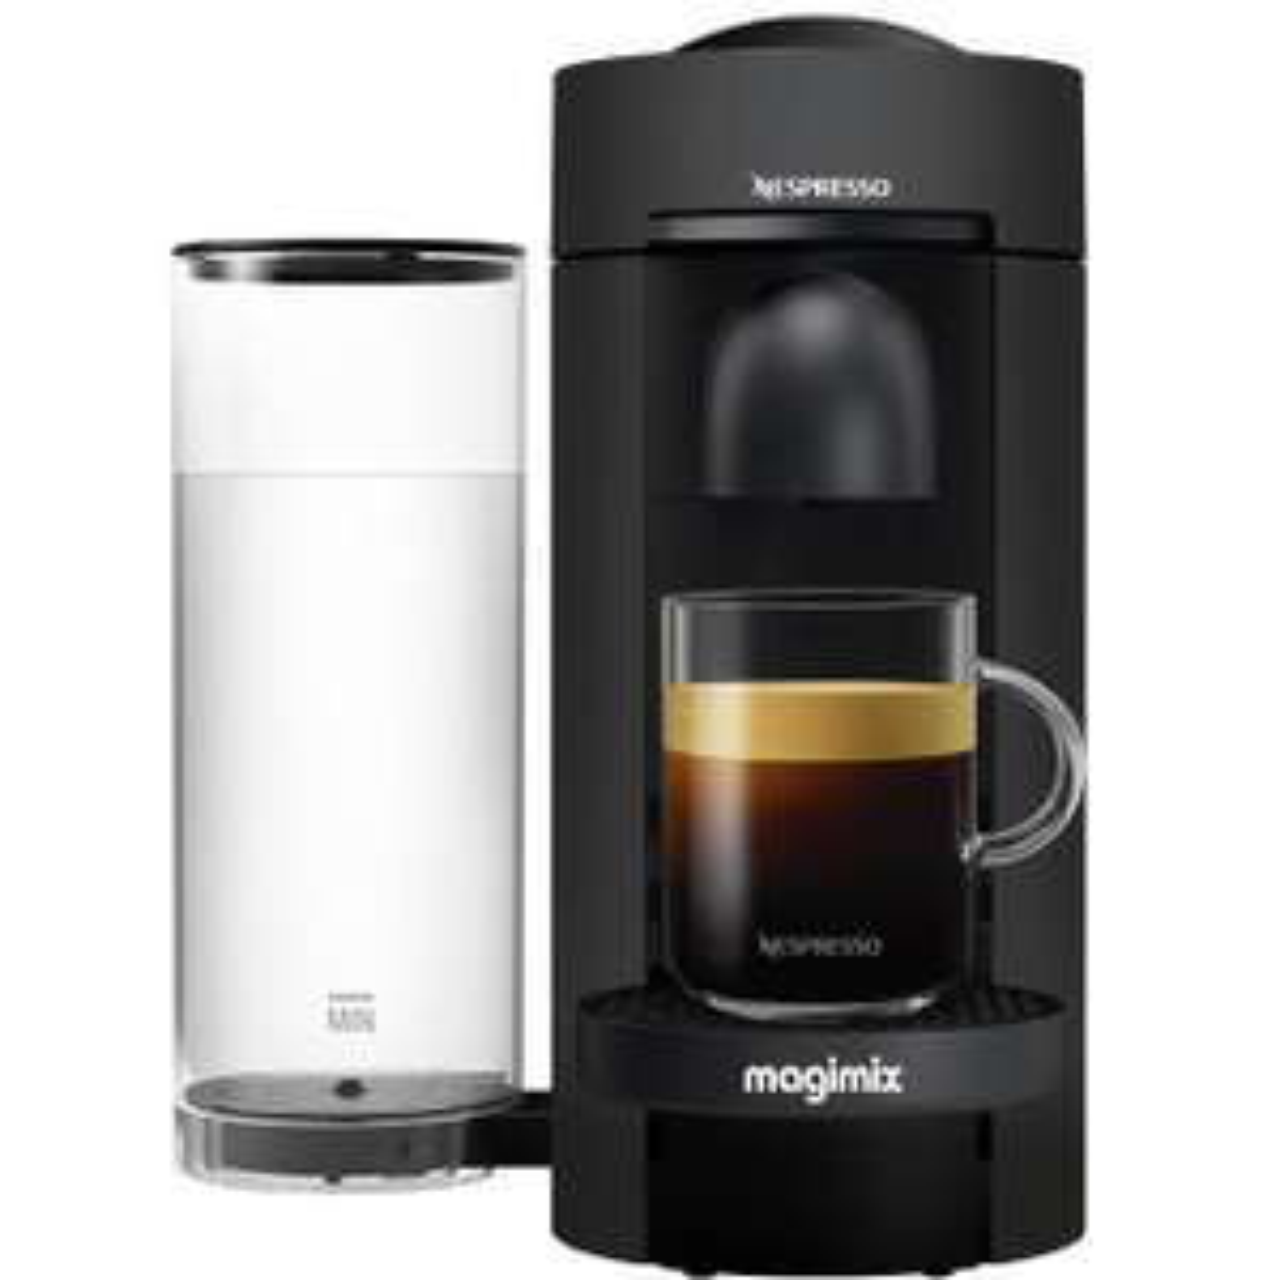 Nespresso by Magimix Vertuo Plus Limited Edition £69 del @ AO